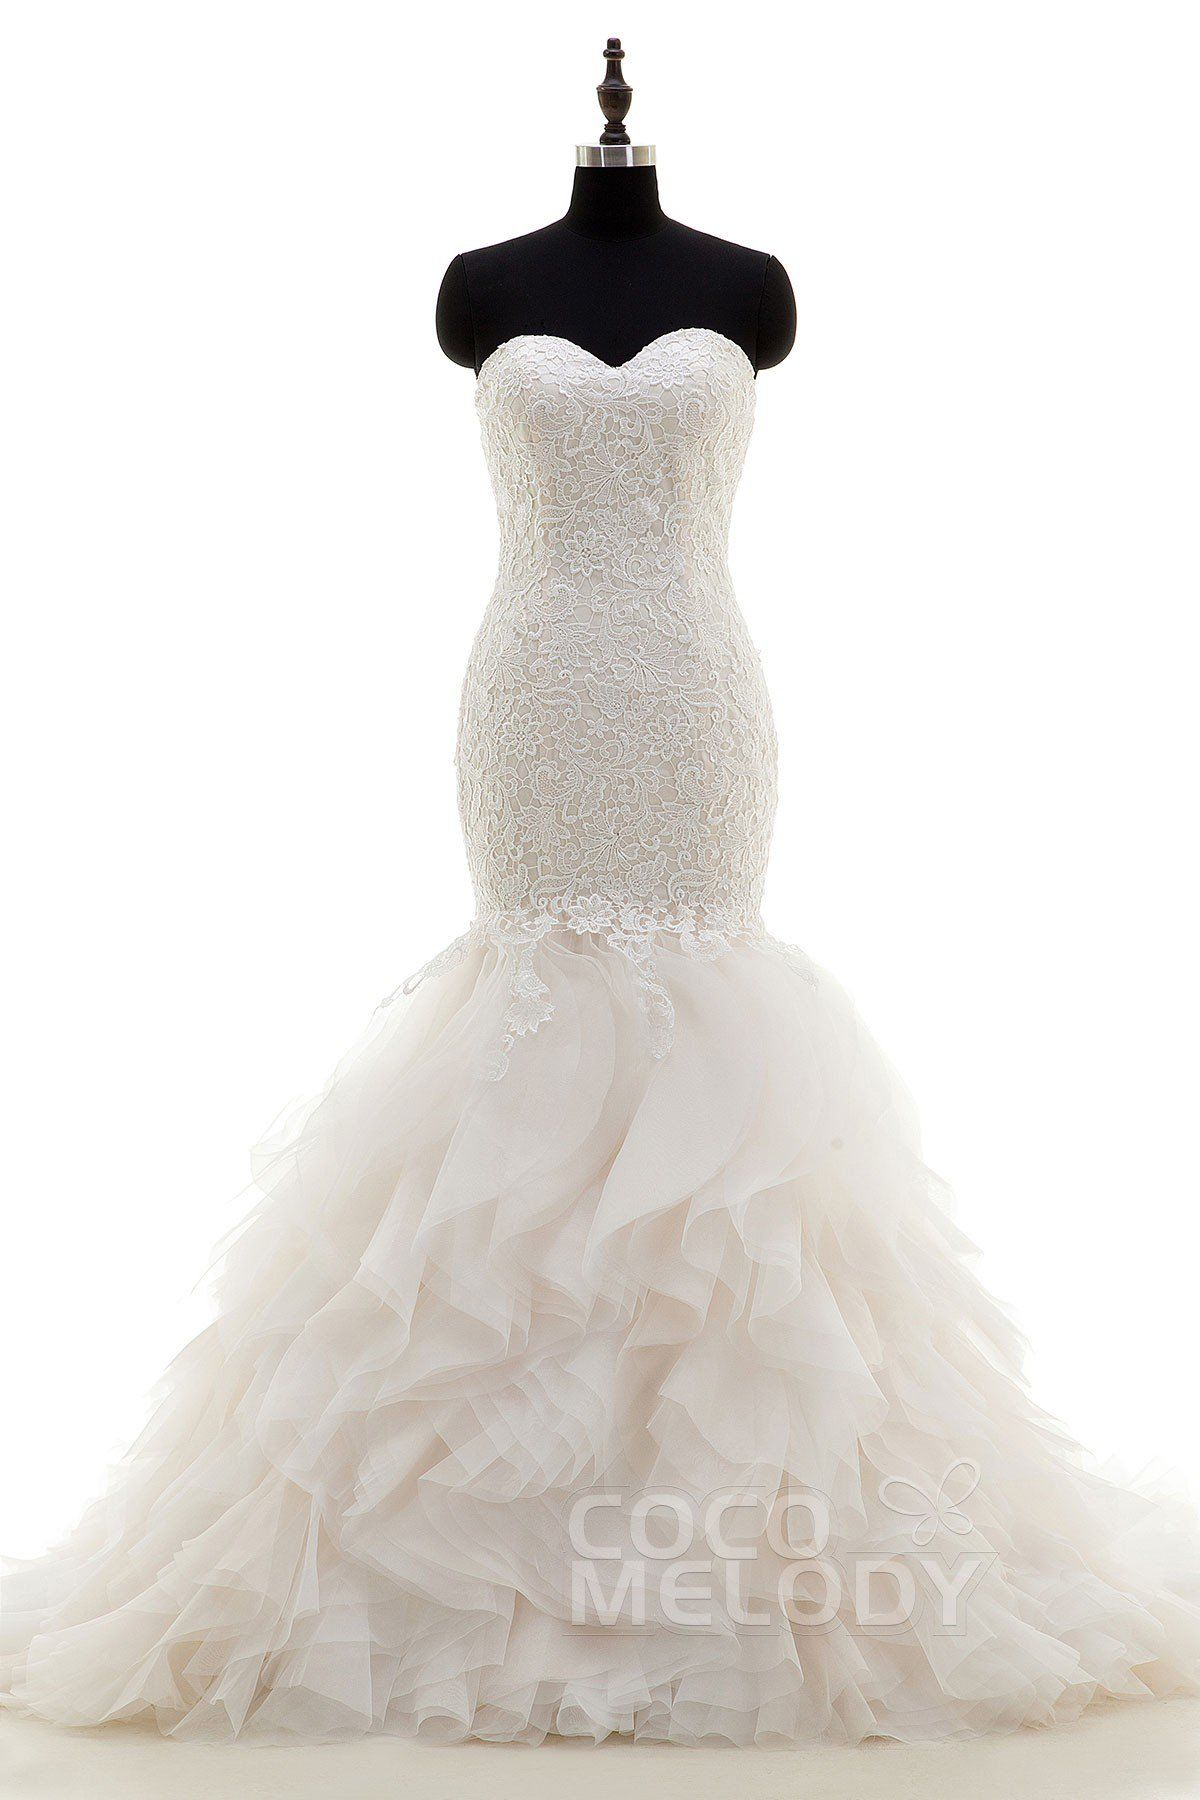 Usd 649 Trumpet Mermaid Train Organza Wedding Dress Lwlt15032 Mermaid Trumpet Wedding Dresses Pink Bridesmaid Dresses Wedding Dress Organza [ 1800 x 1200 Pixel ]